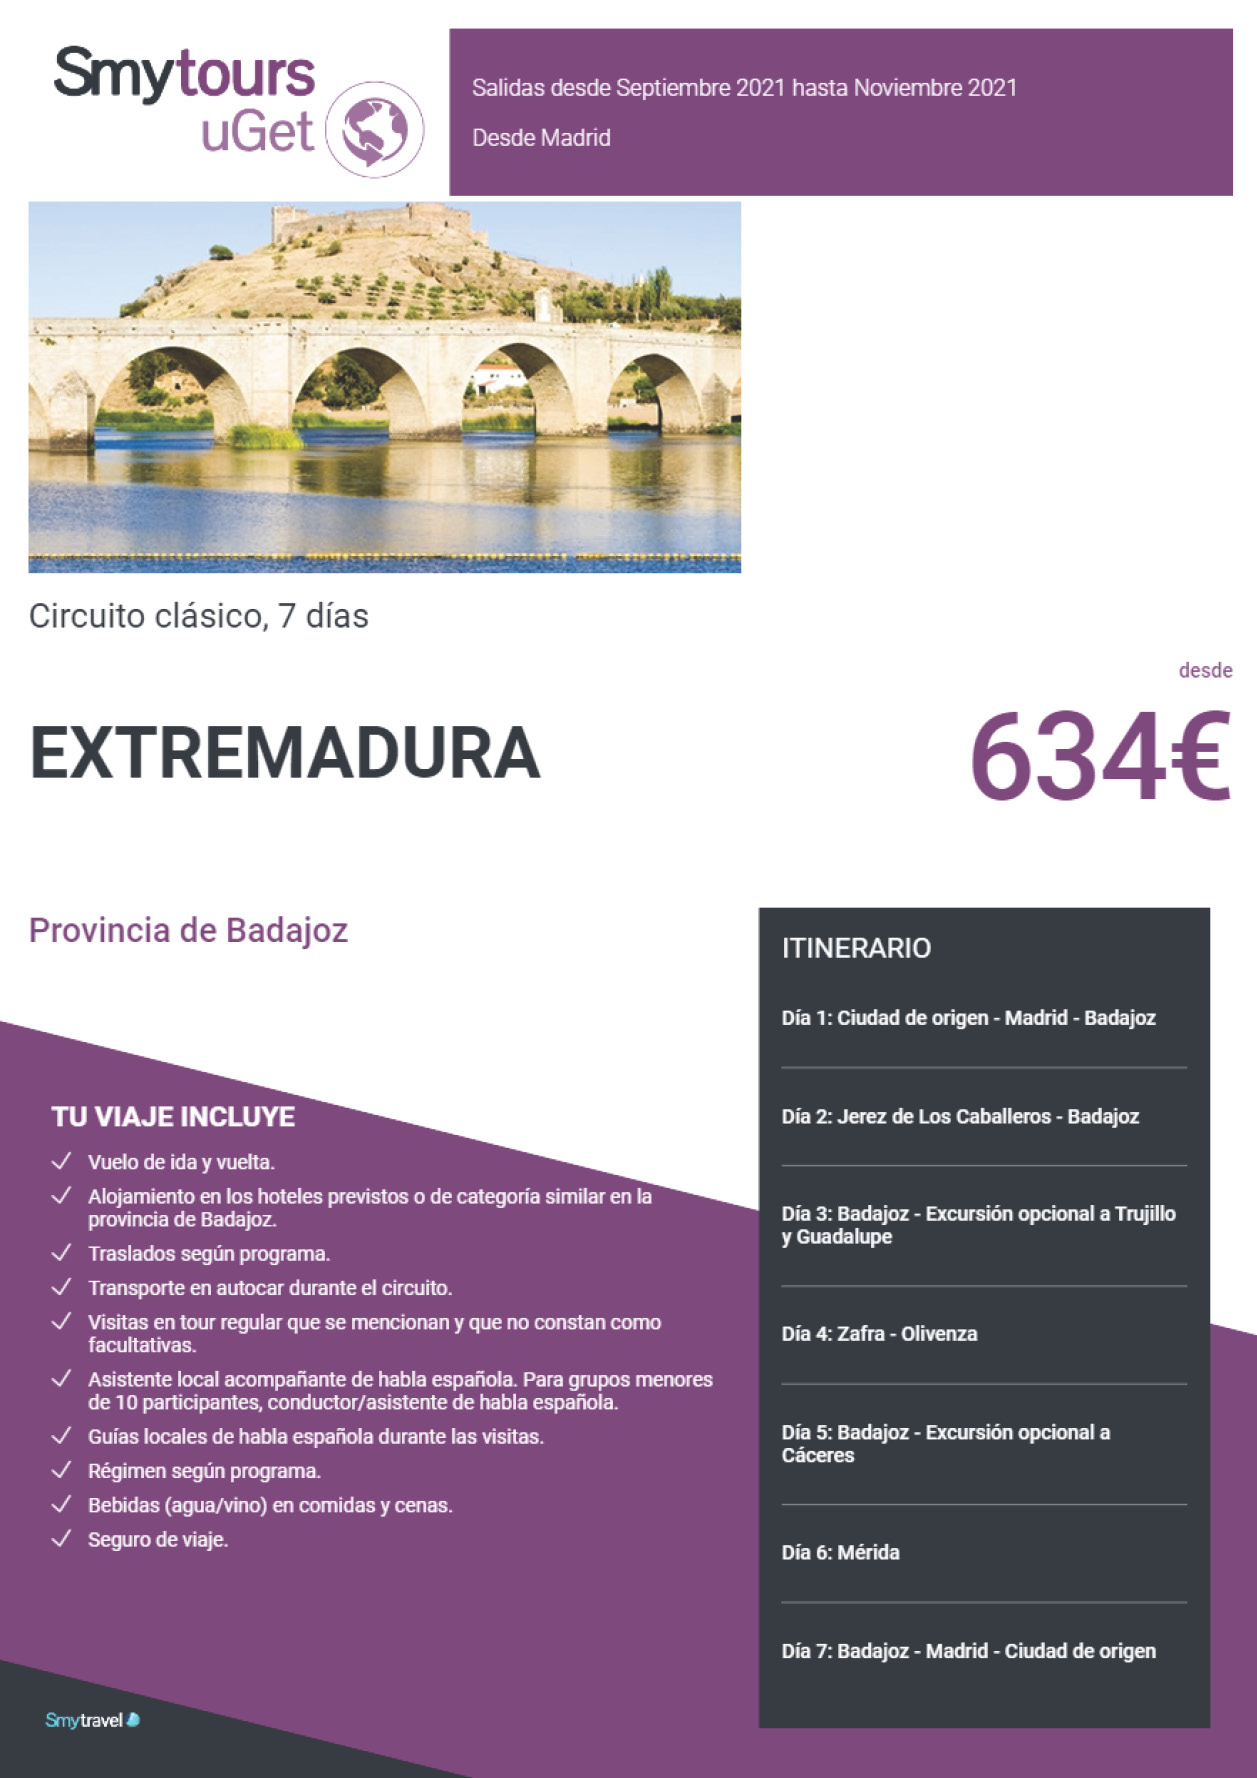 Oferta Smytravel Circuito Provincia de Badajoz 7 dias salidas Madrid desde 634 €